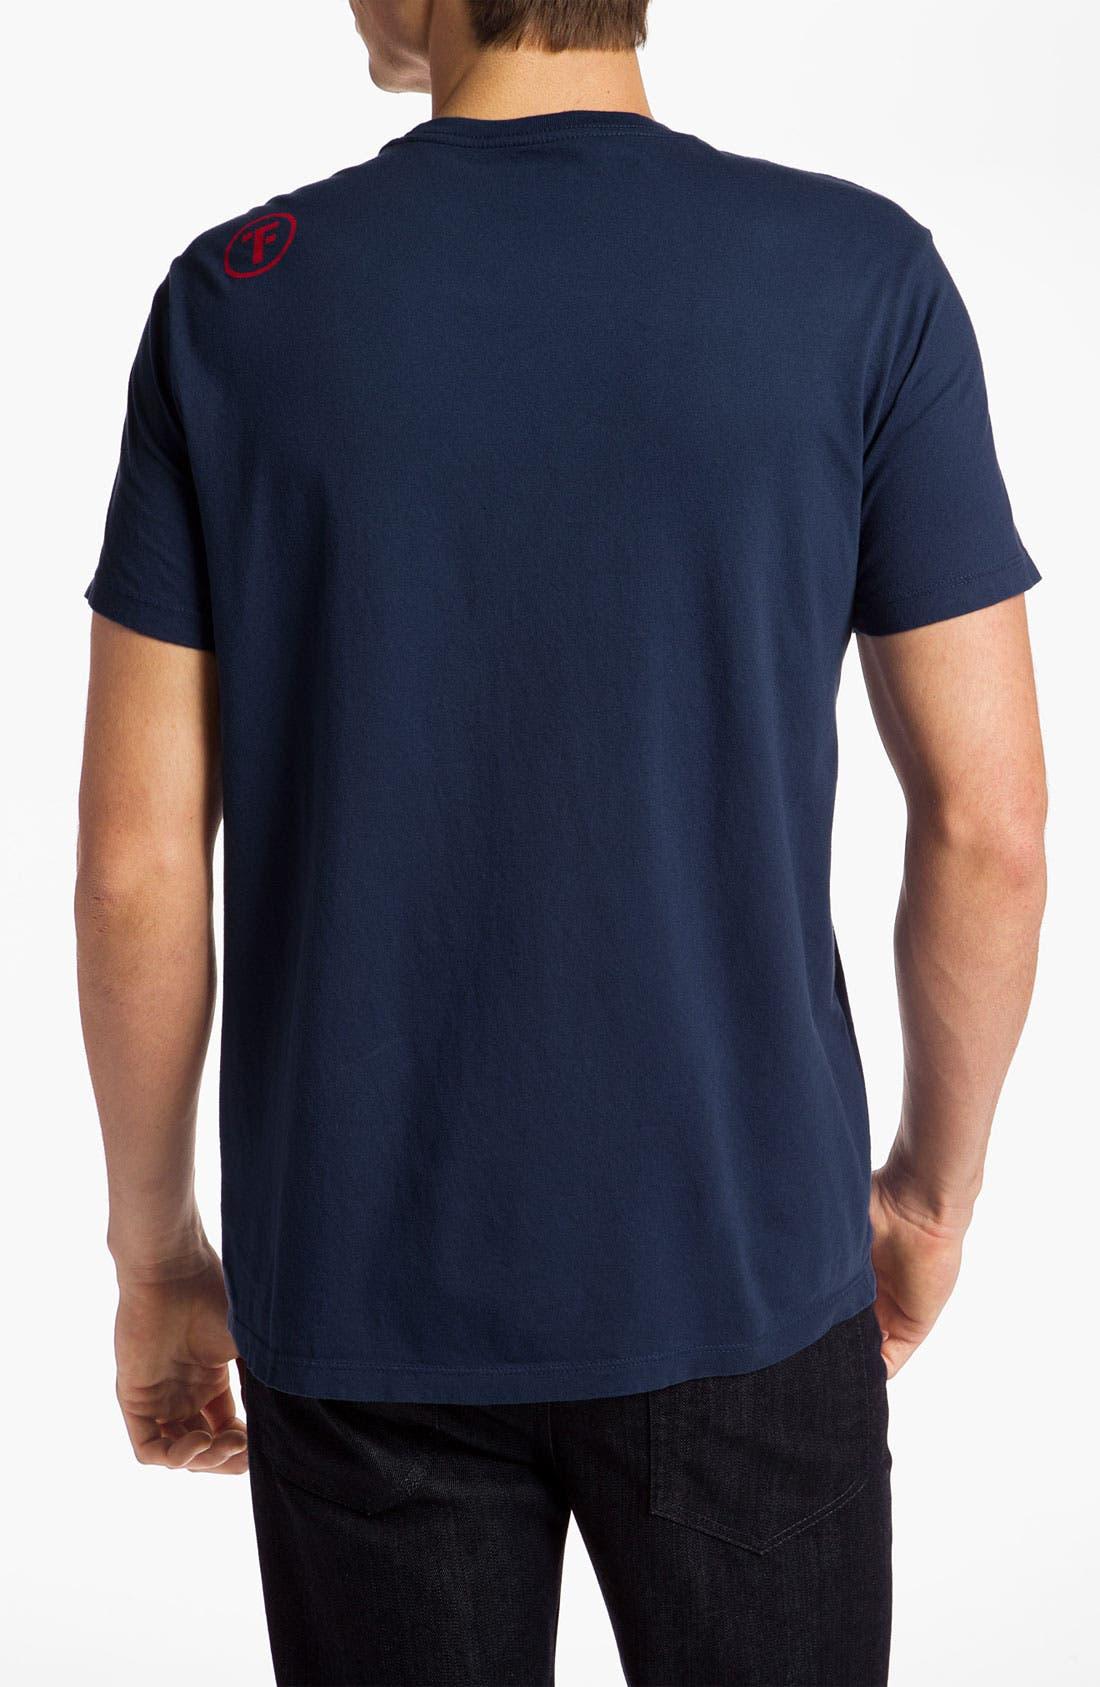 Alternate Image 2  - Tankfarm 'Grand Prix' Graphic T-Shirt